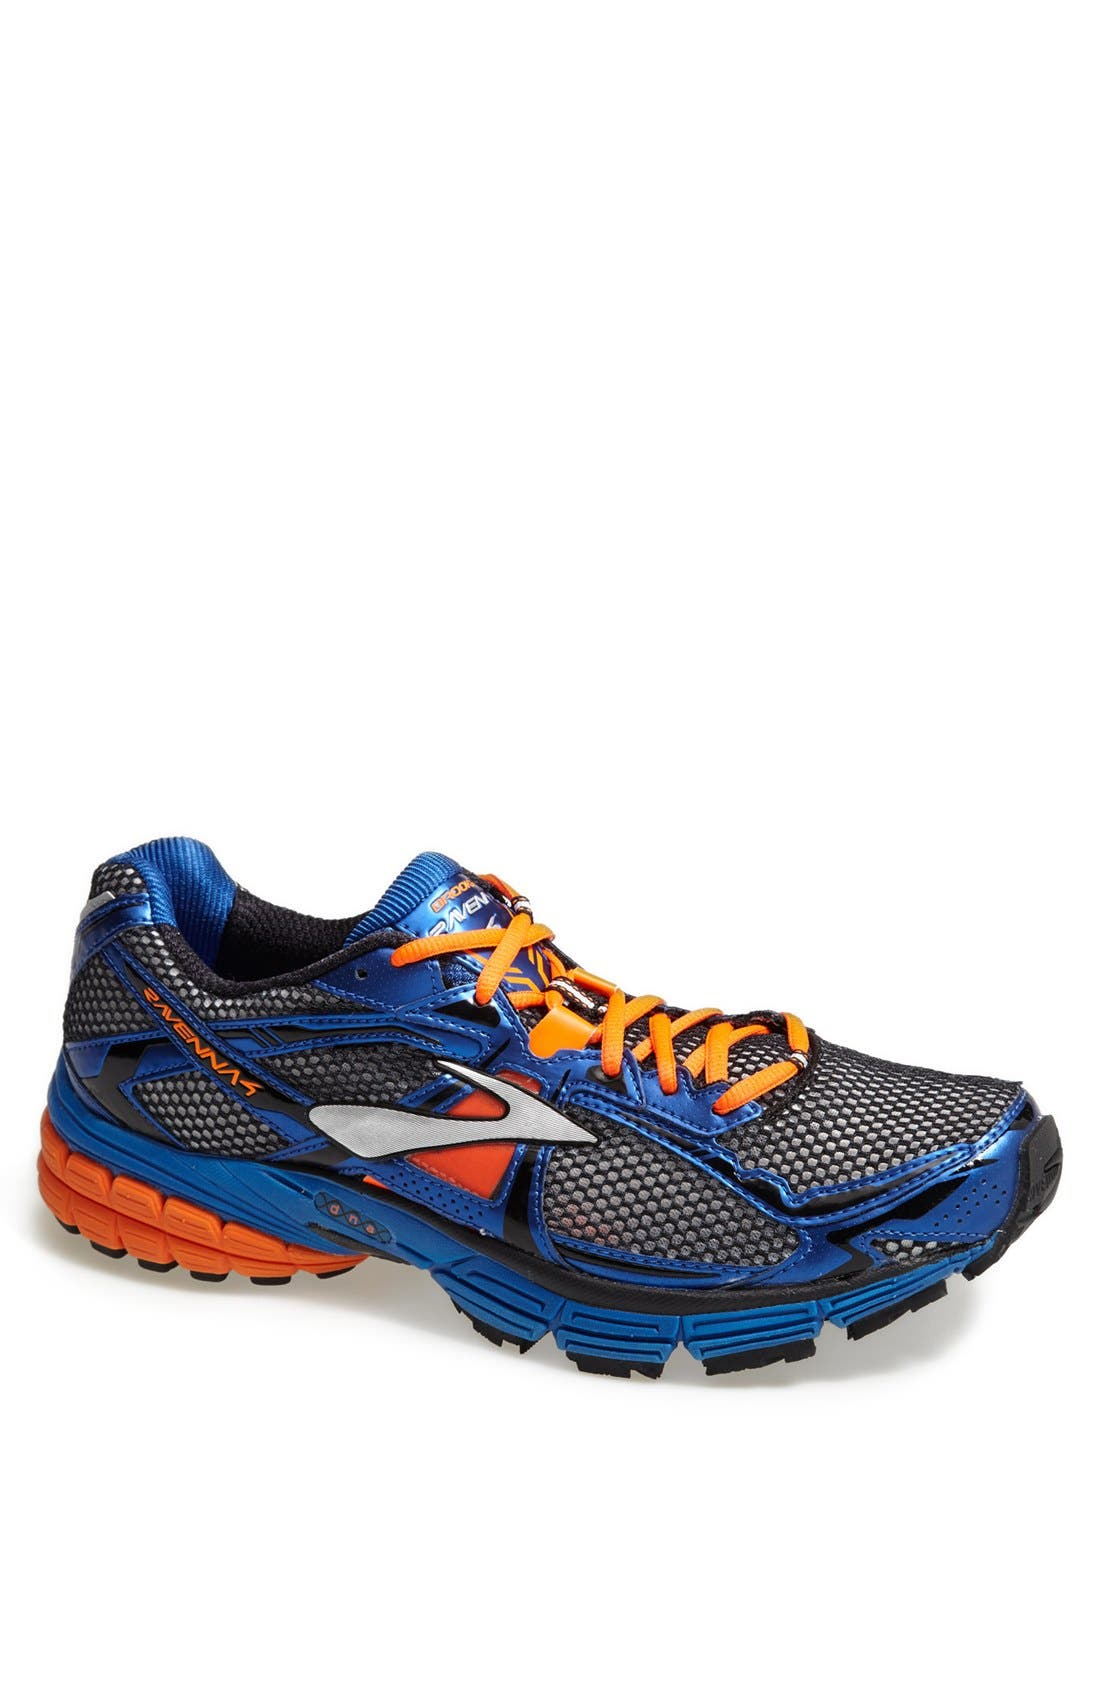 Alternate Image 1 Selected - Brooks 'Ravenna 4' Running Shoe (Men)